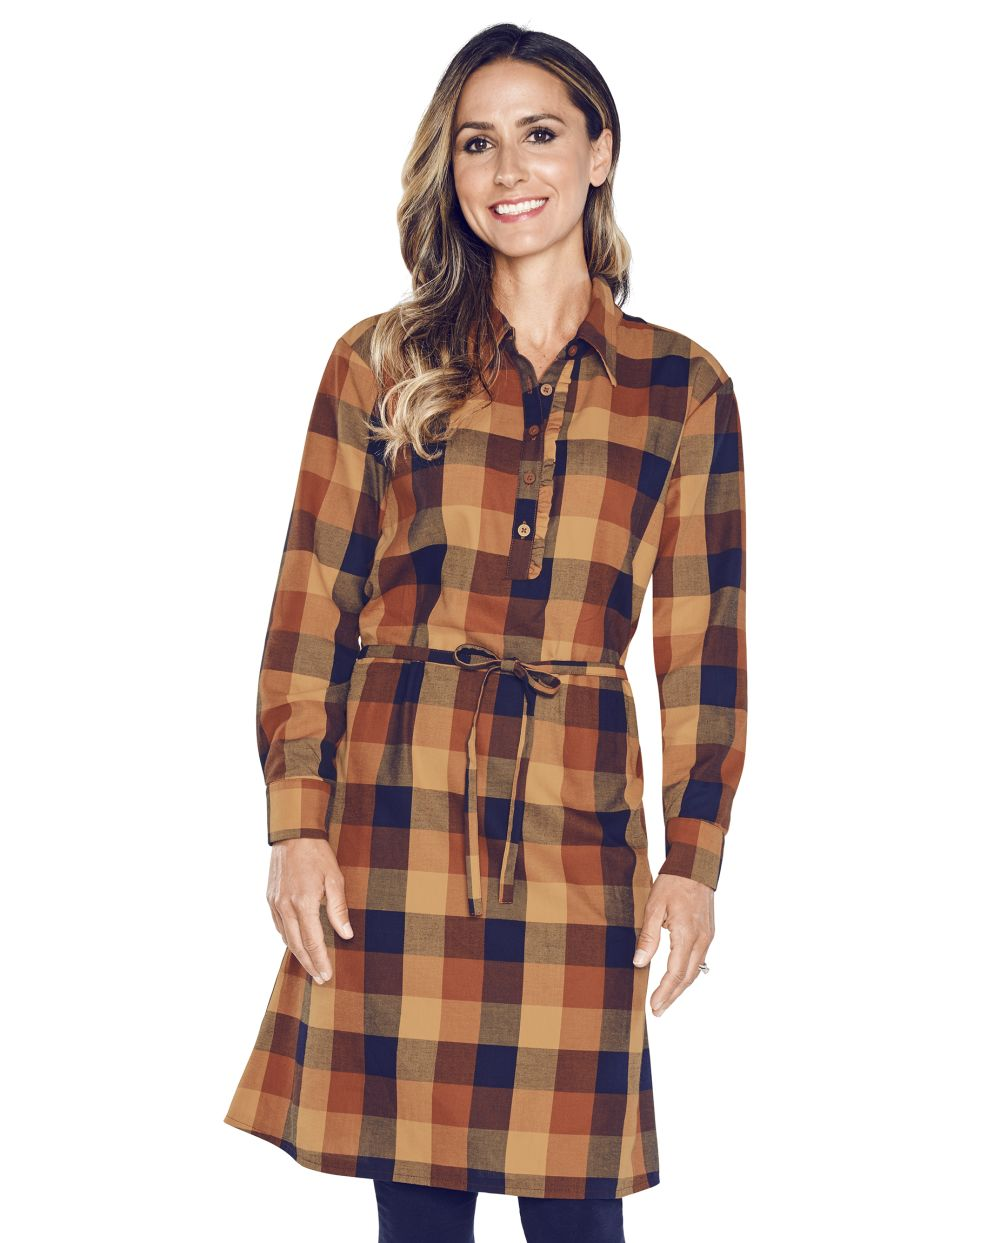 Womens Matching Family Plaid Shirt Dress - Brown